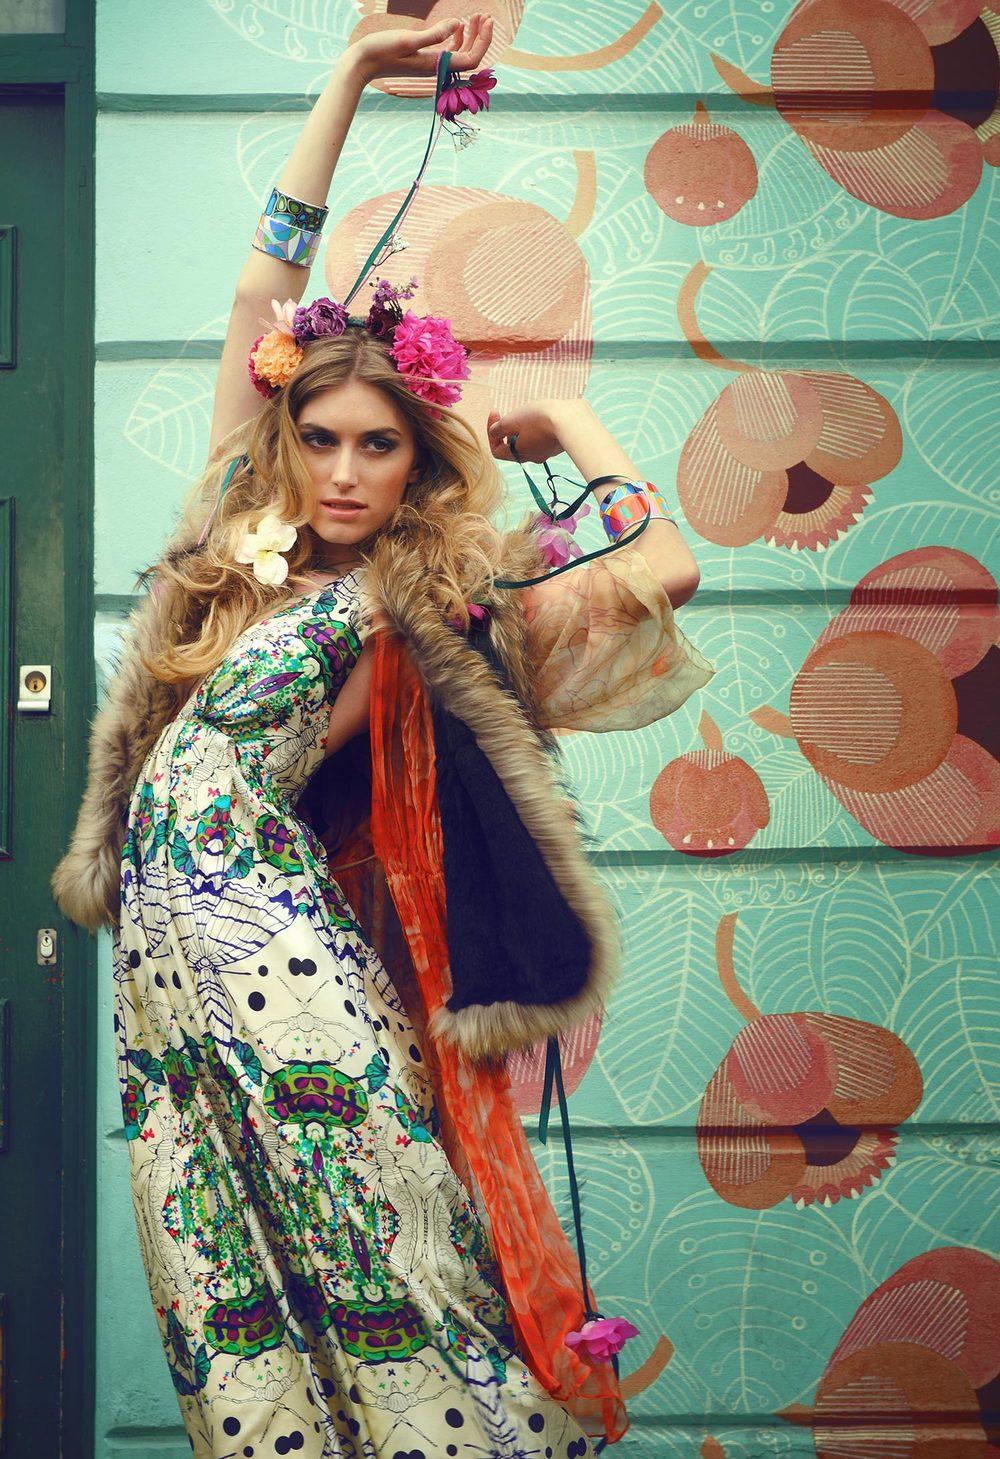 Photographer - Tiffany Mumford  Stylist - Alex Longmore  Hair & Makeup - Elizabeth Hsieh  Props Stylist - Hannah Read-Baldrey  Model - Bo@ Select